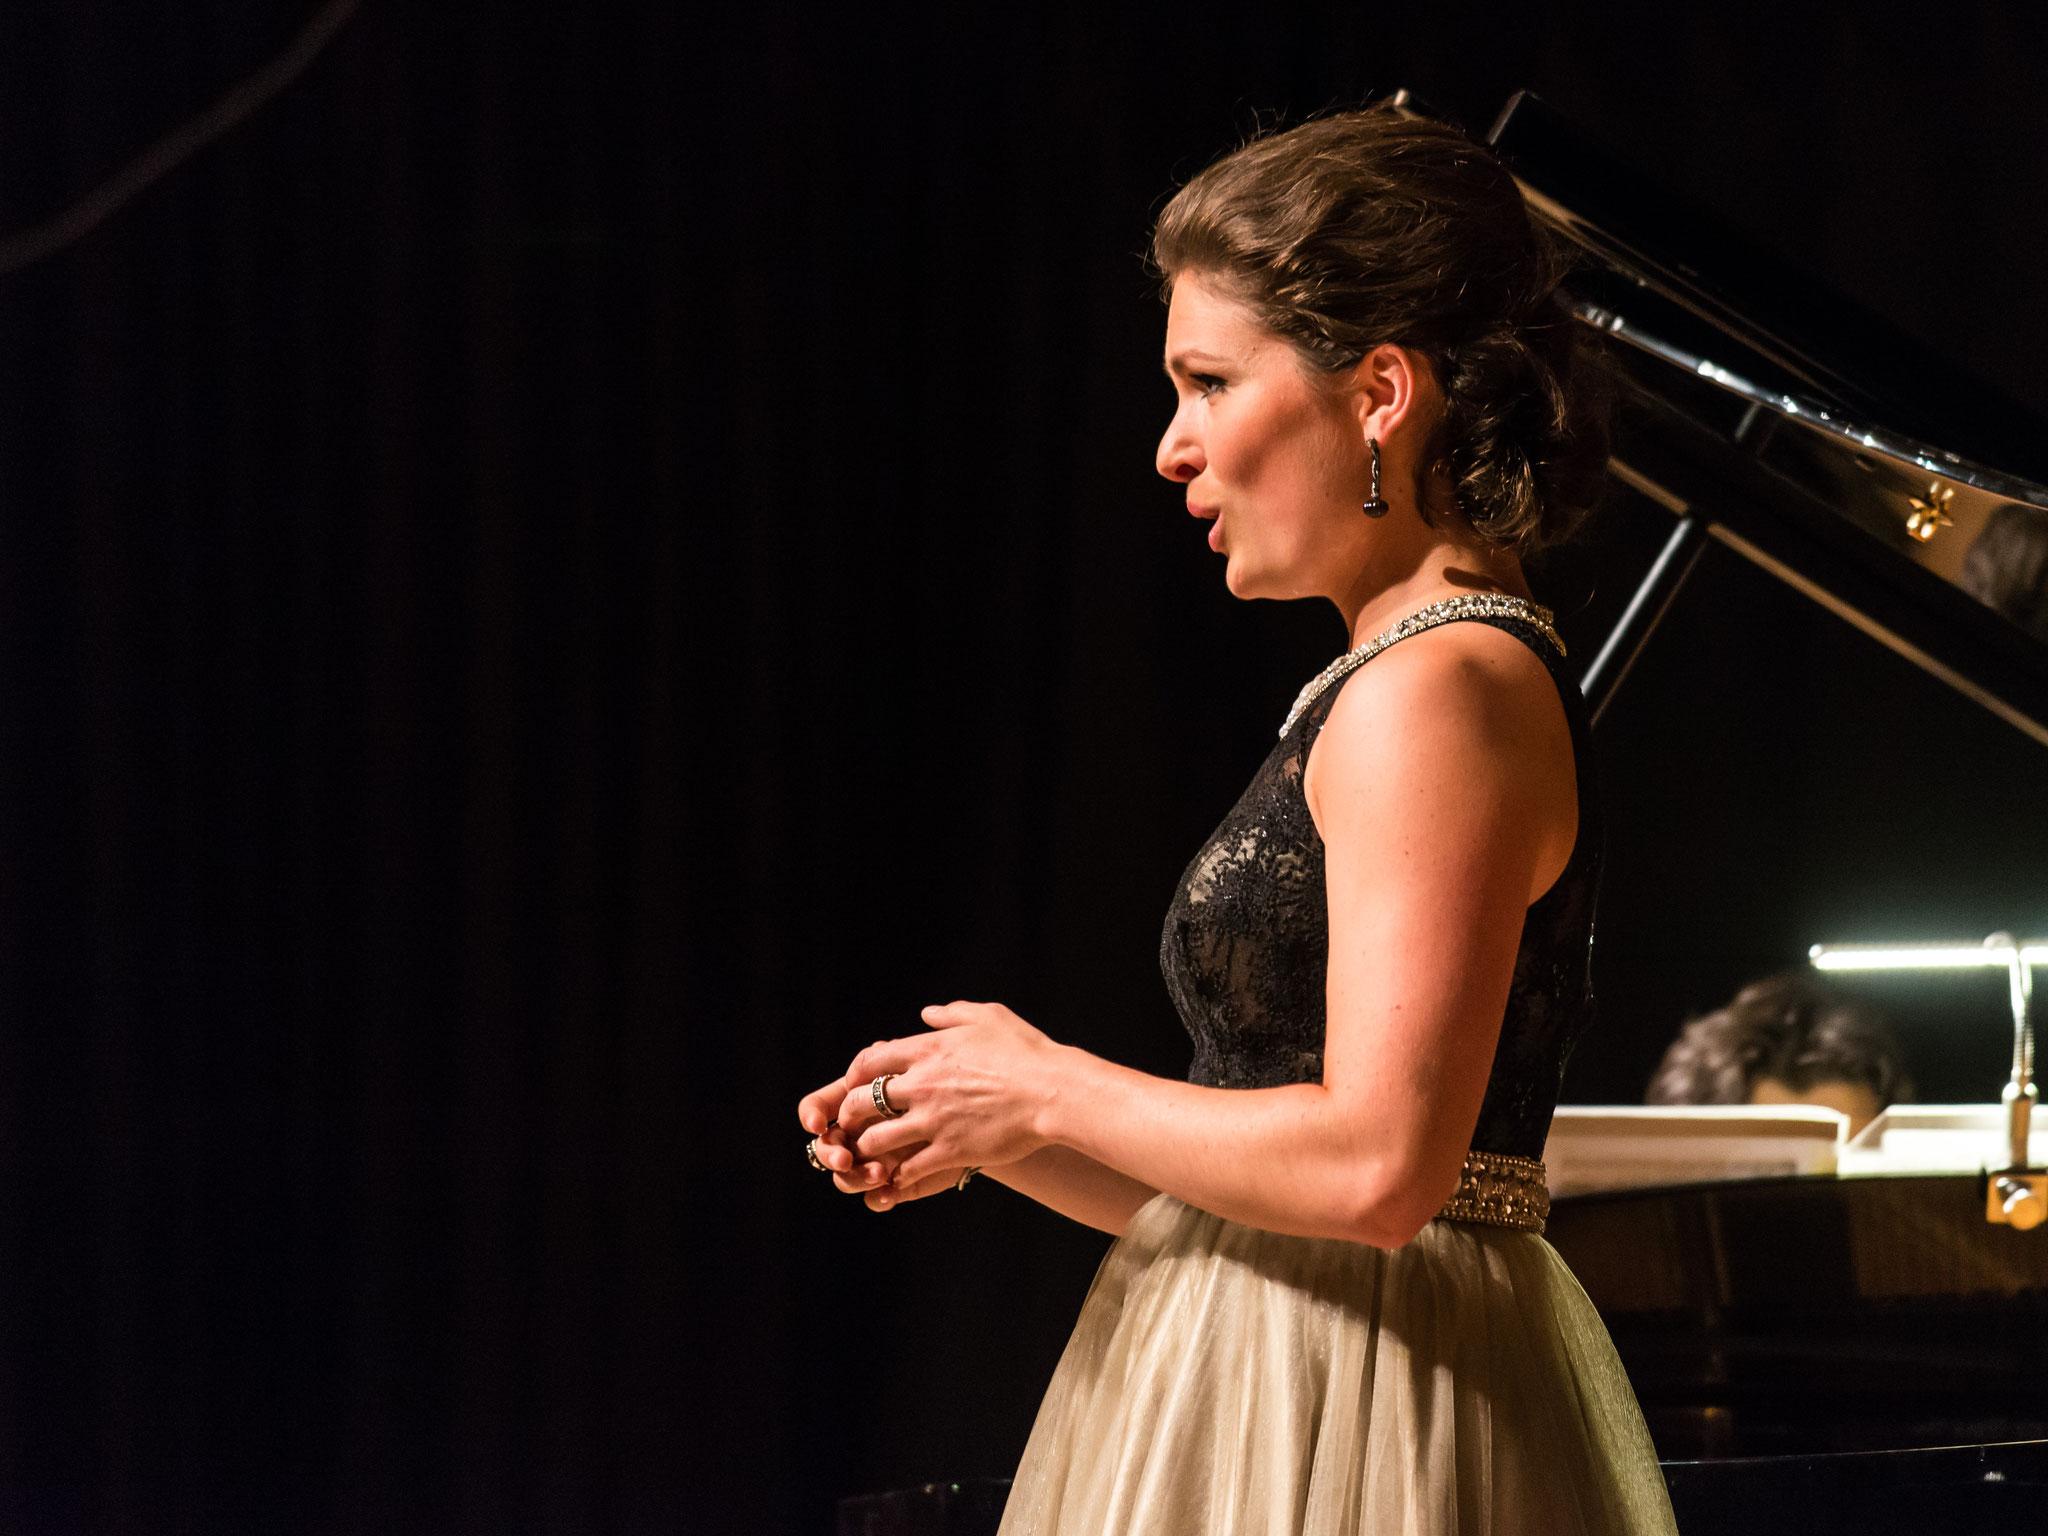 Final Master Exam, Royal Conservatory @ The Hague, Charlotte Houberg - Soprano